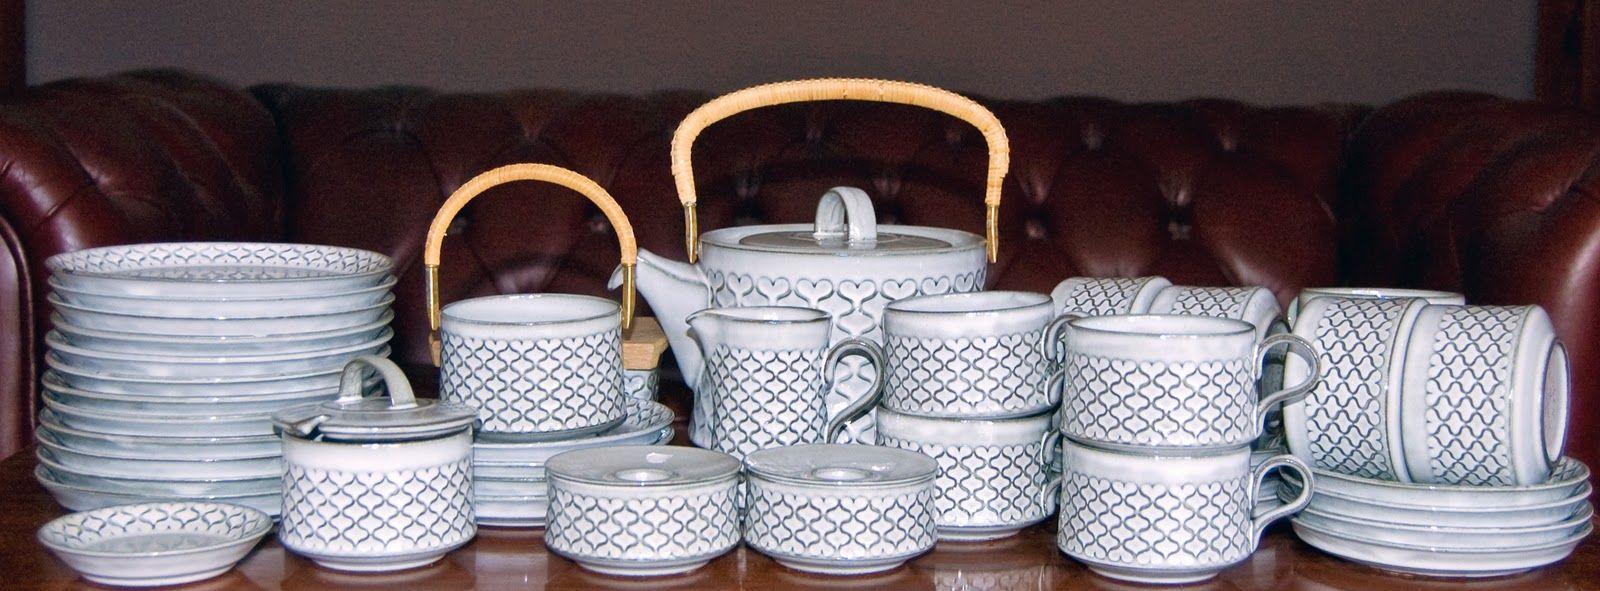 10 Person Stoneware Tea Set By Nissen Of Denmark This Pattern Is Called Cordelia Or Cordial In English Vintage Ceramic Ceramics Tea Set